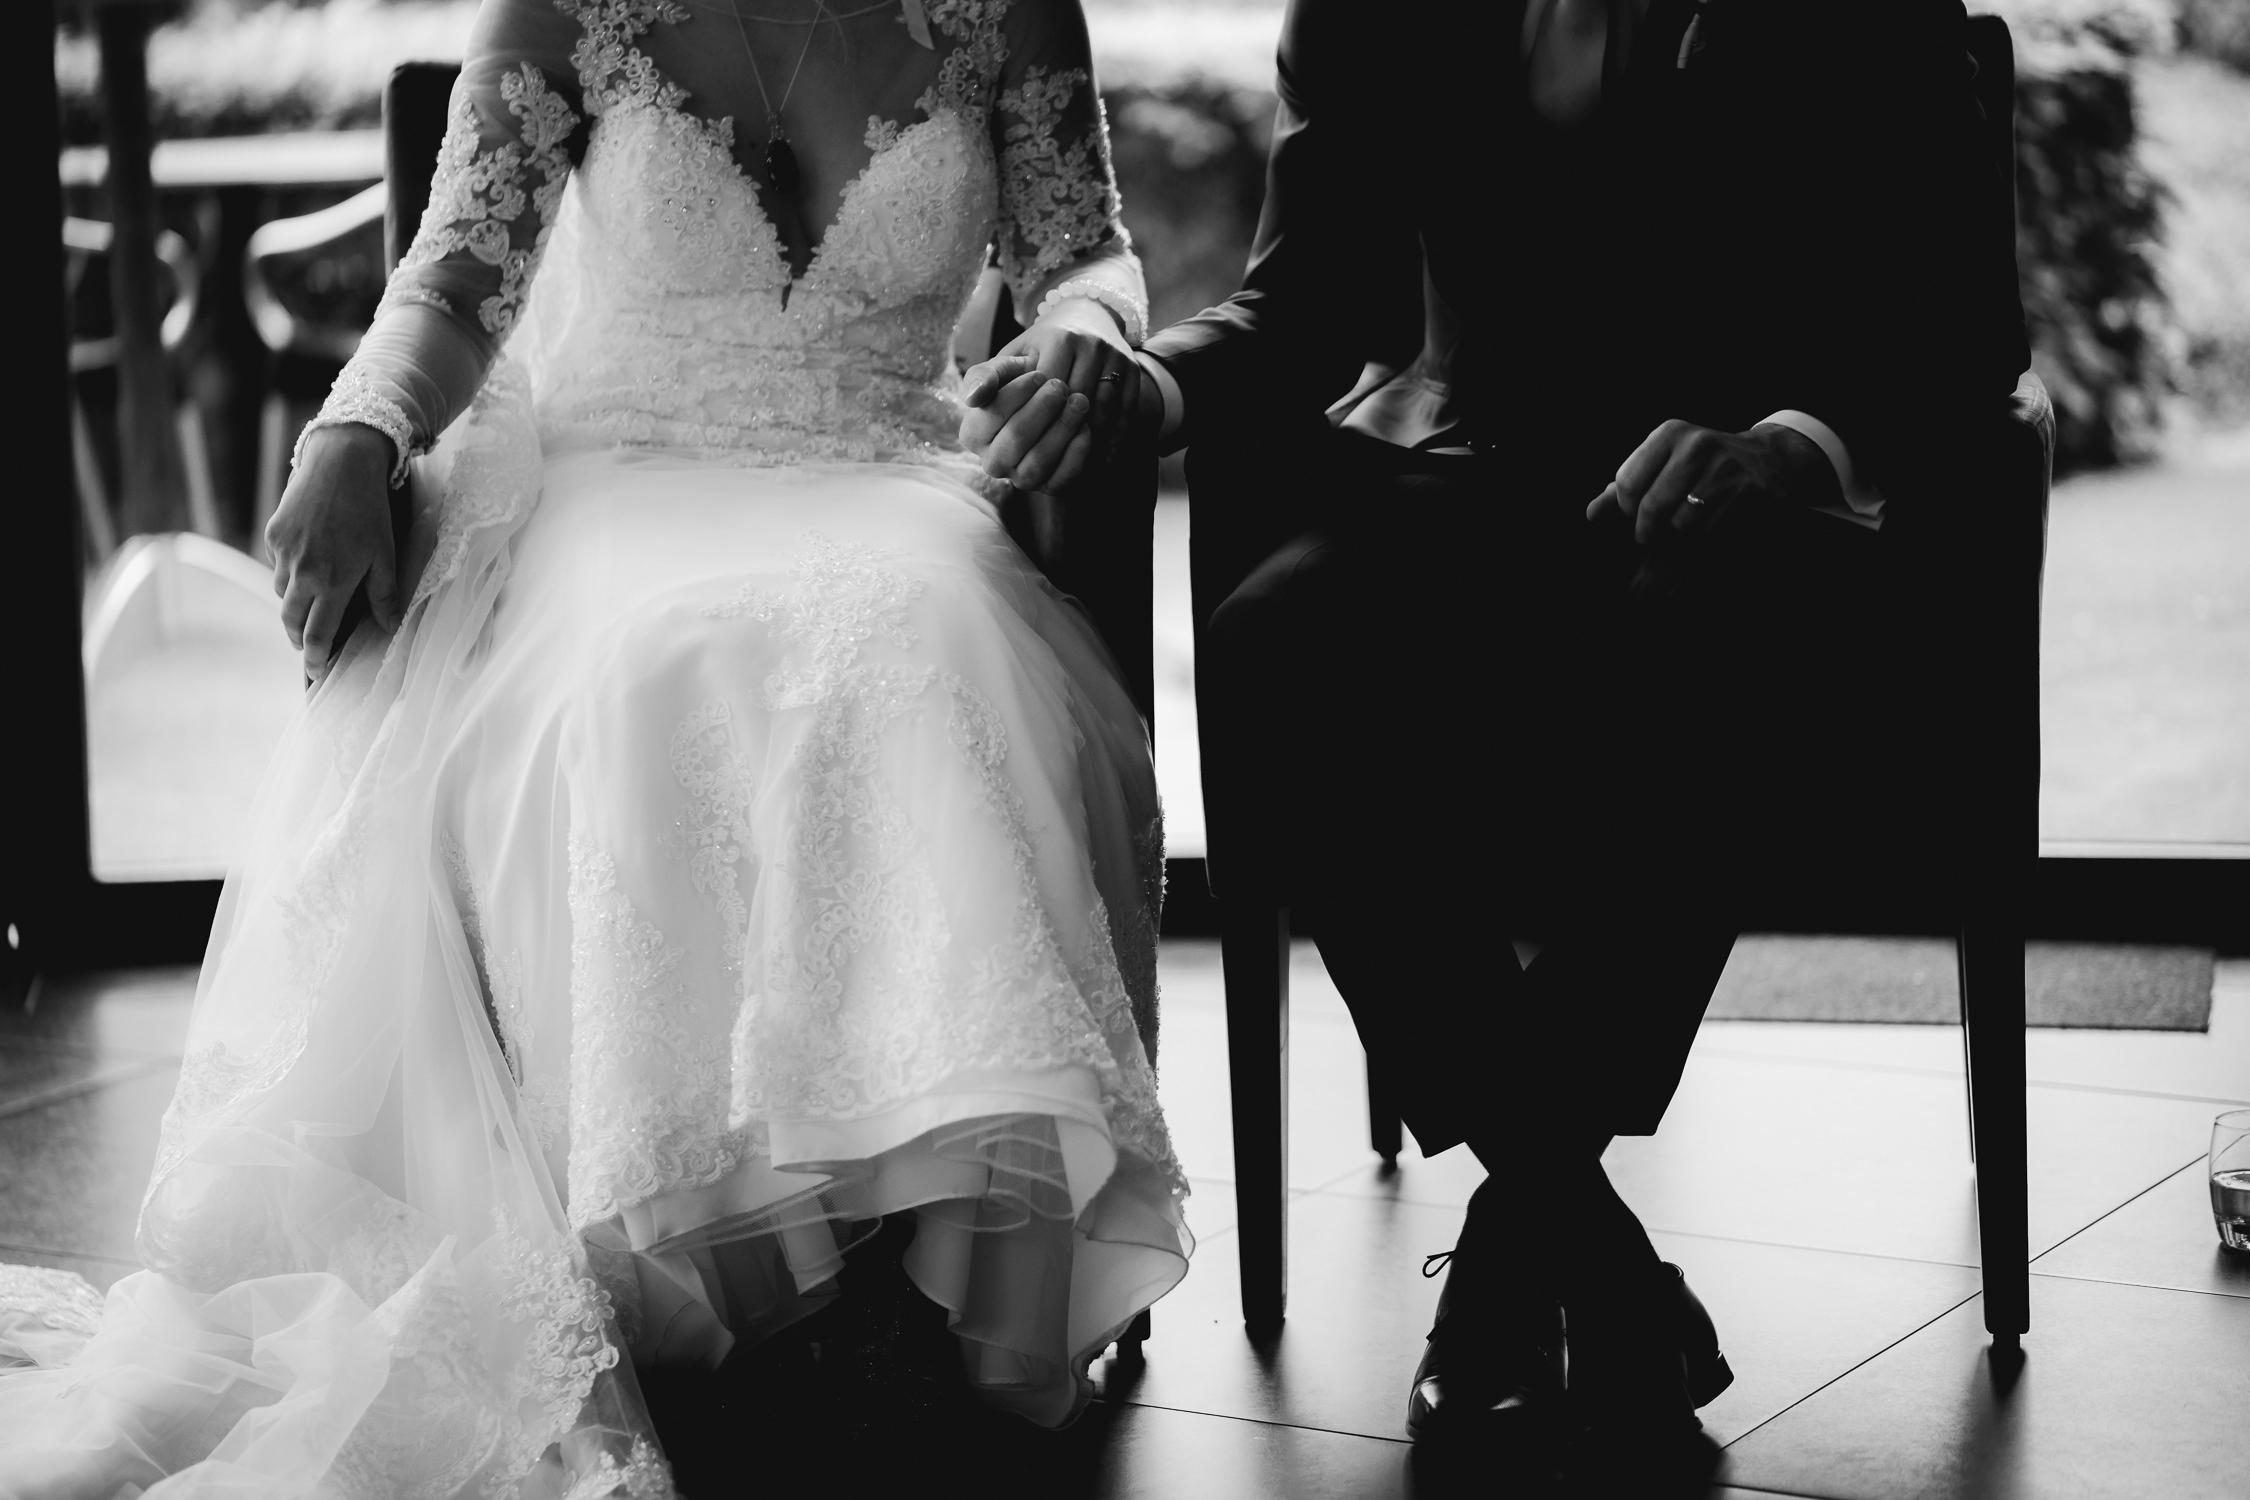 bruidsfotografie-amsterdam-utrecht-trouwfotograaf-mark-hadden-wedding-photography-Robin & Guus-198-2.jpg